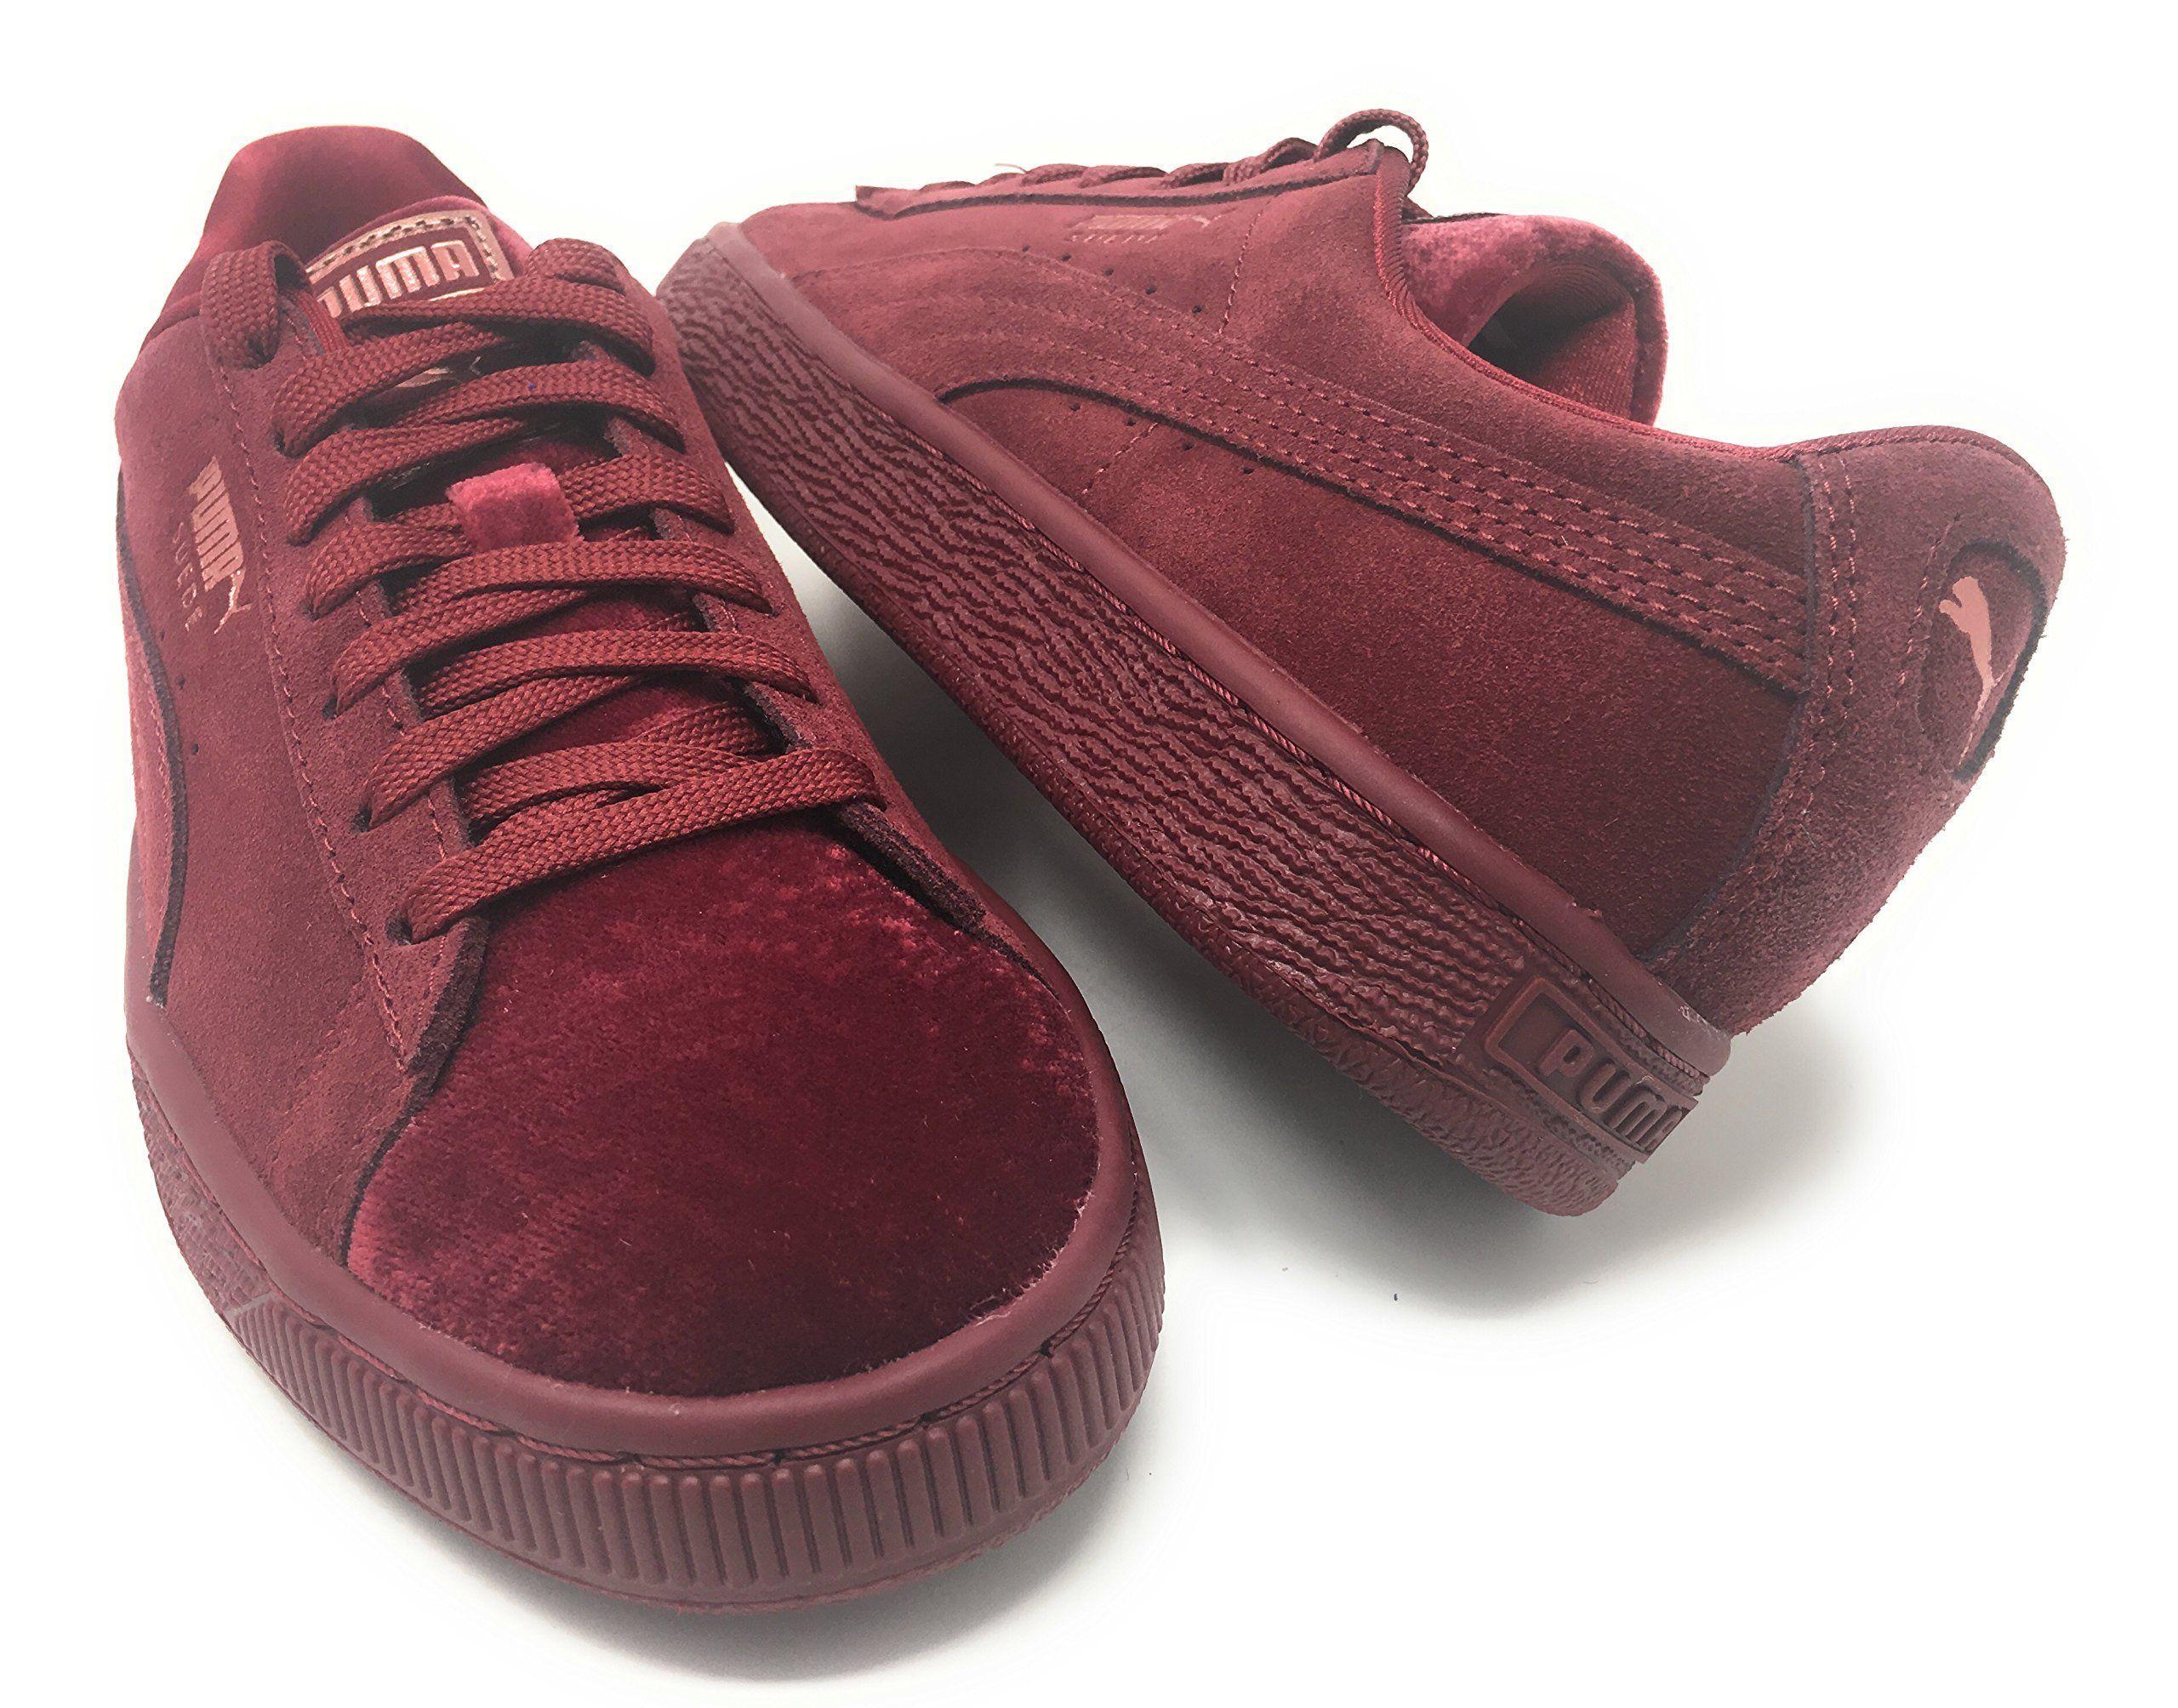 timeless design a3c1f 5a8fb PUMA Suede Classic Velvet Women | Red (36620901) | Shoes